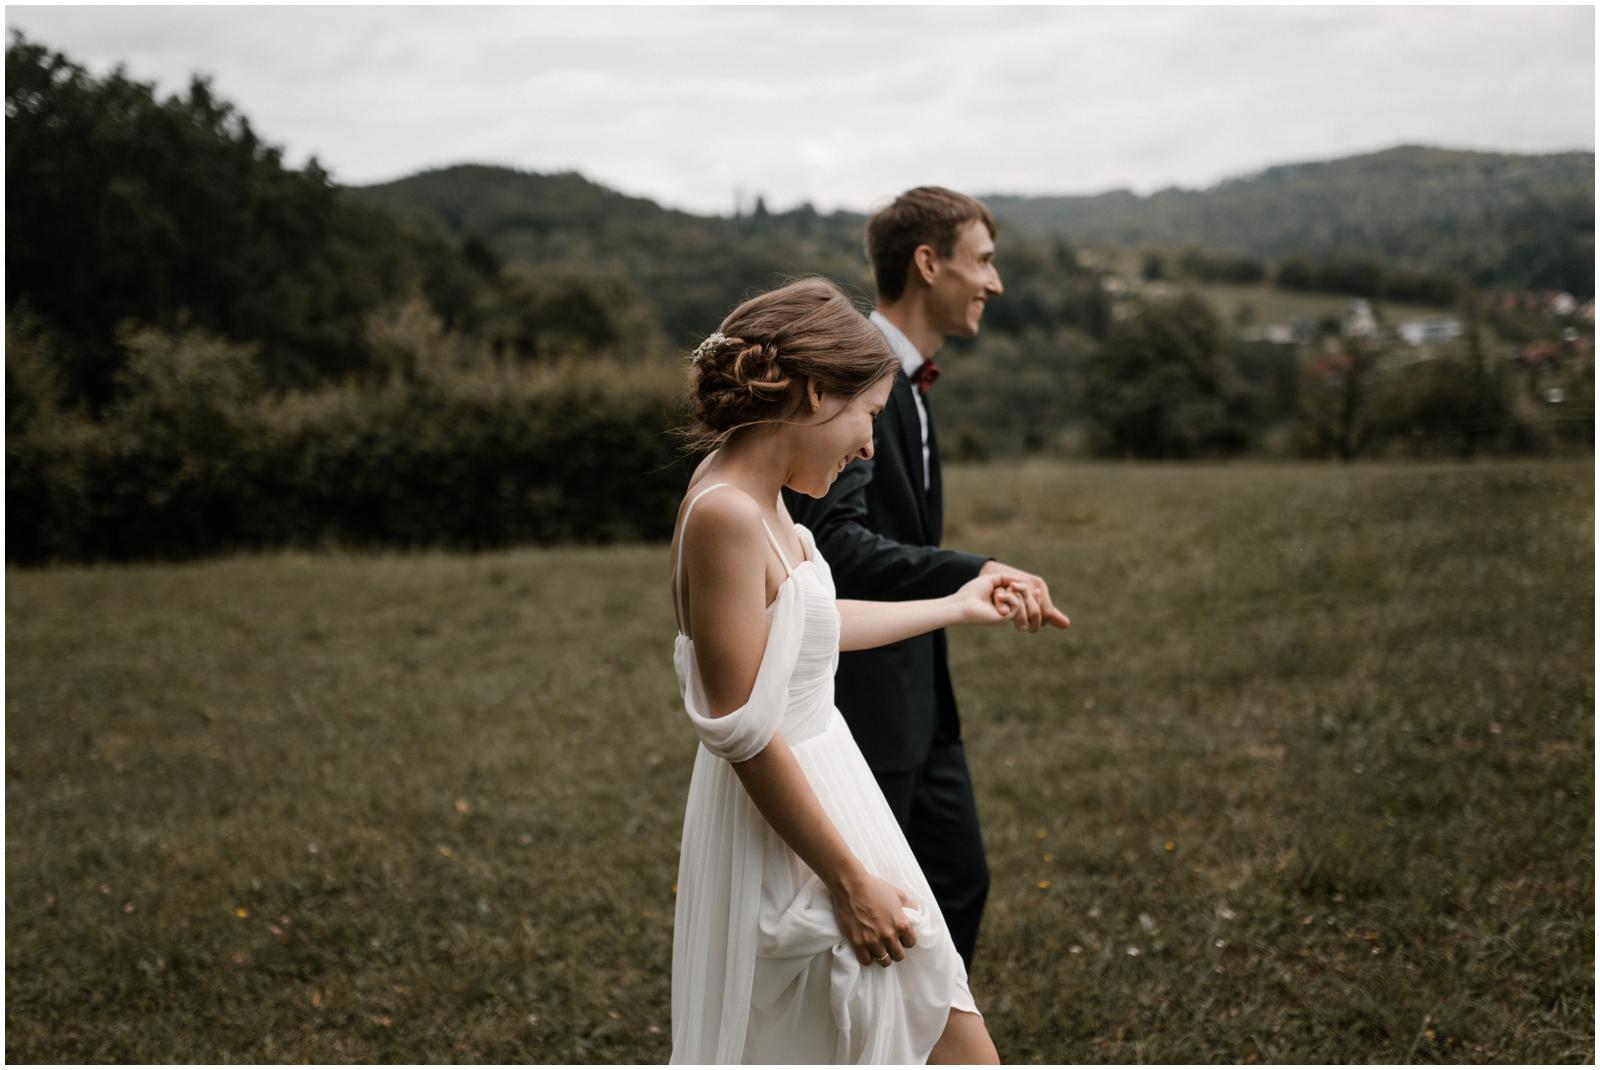 mirjam_thomas_wedding-194.jpg